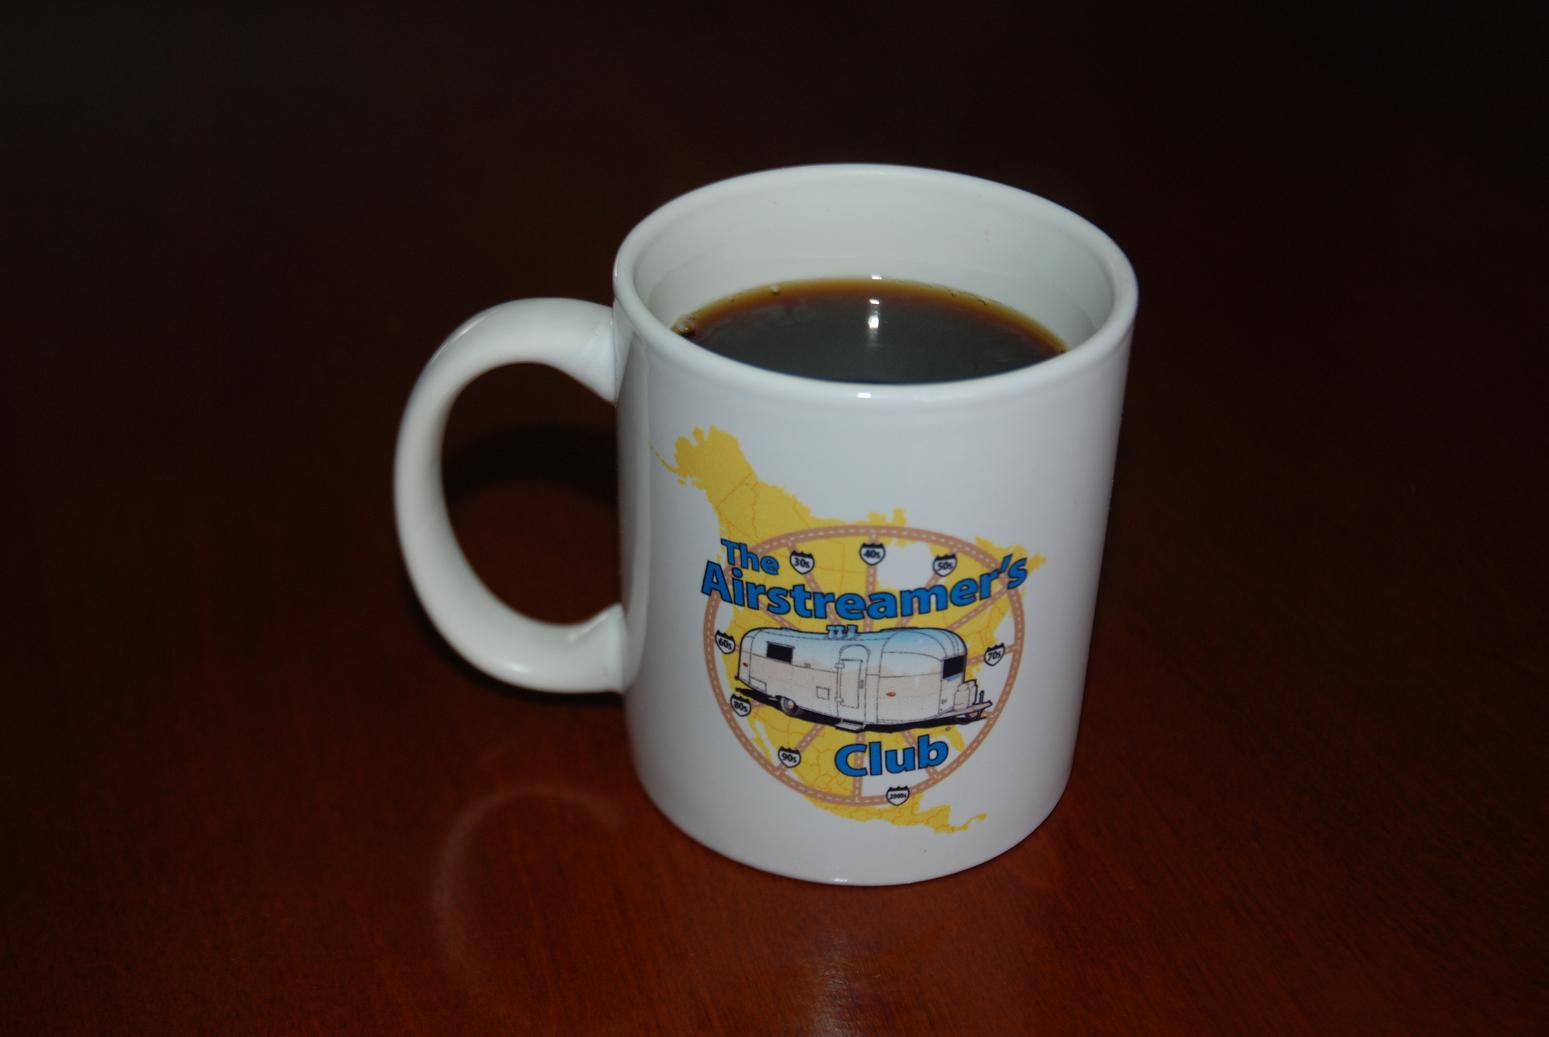 Click image for larger version  Name:tac mug 1.JPG Views:238 Size:107.9 KB ID:101478